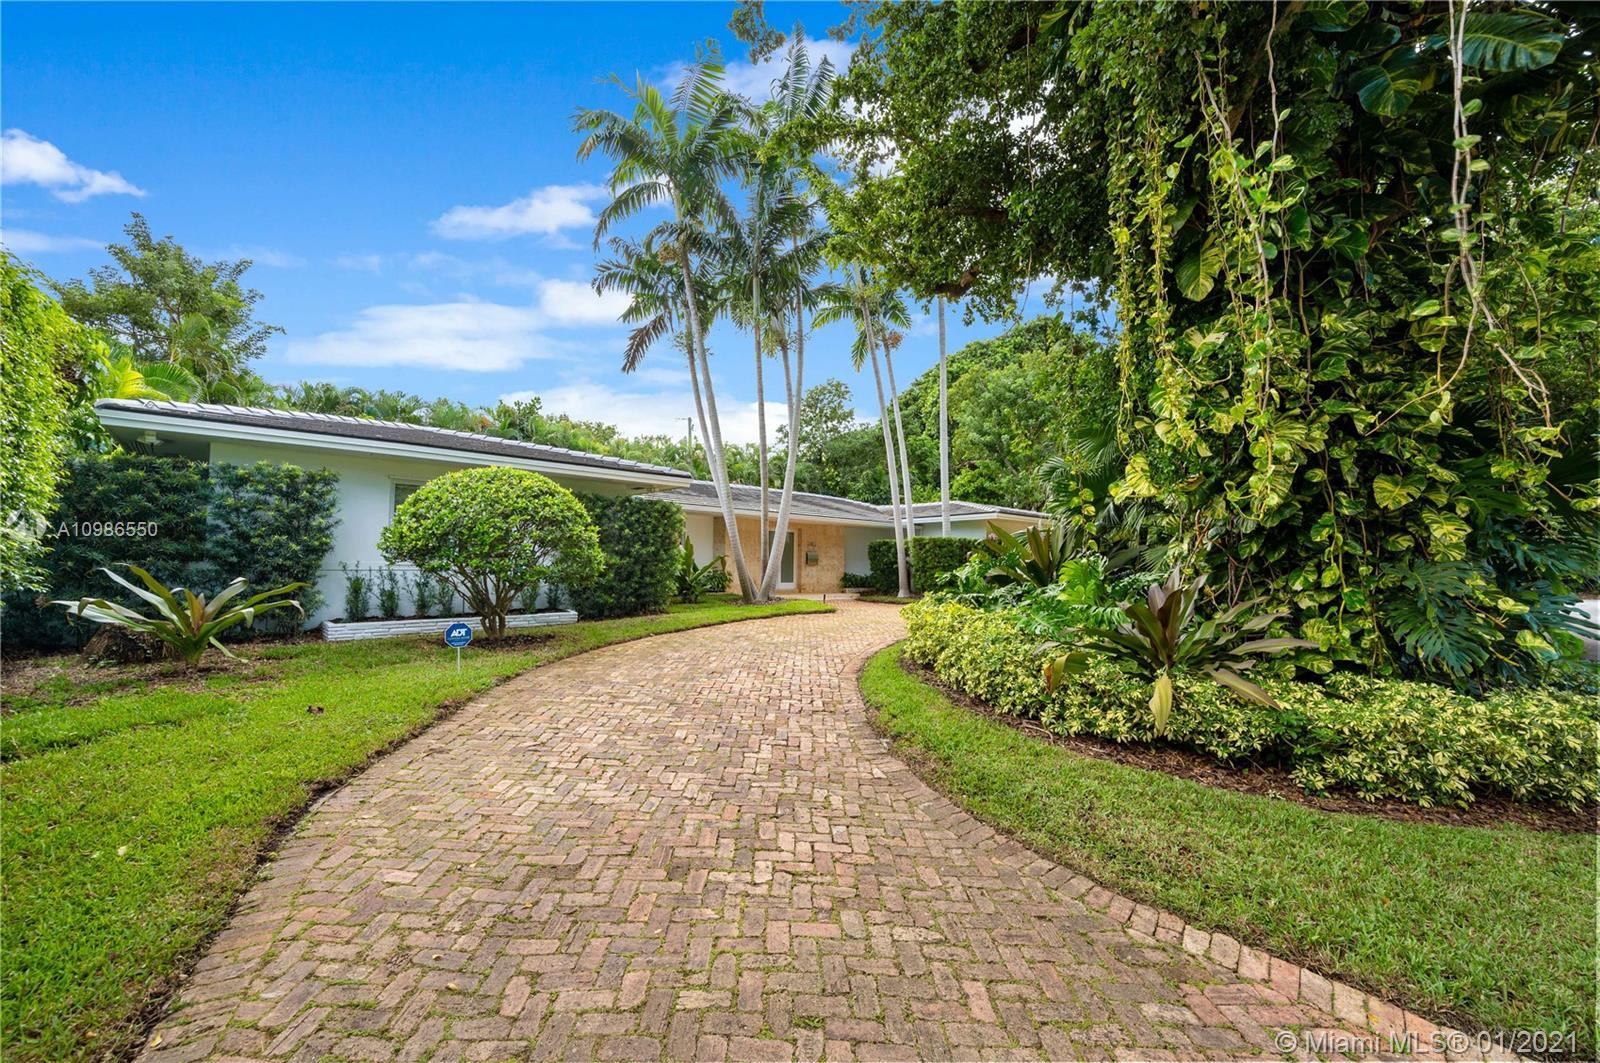 South Miami - 740 Coronado Ave, Coral Gables, FL 33143